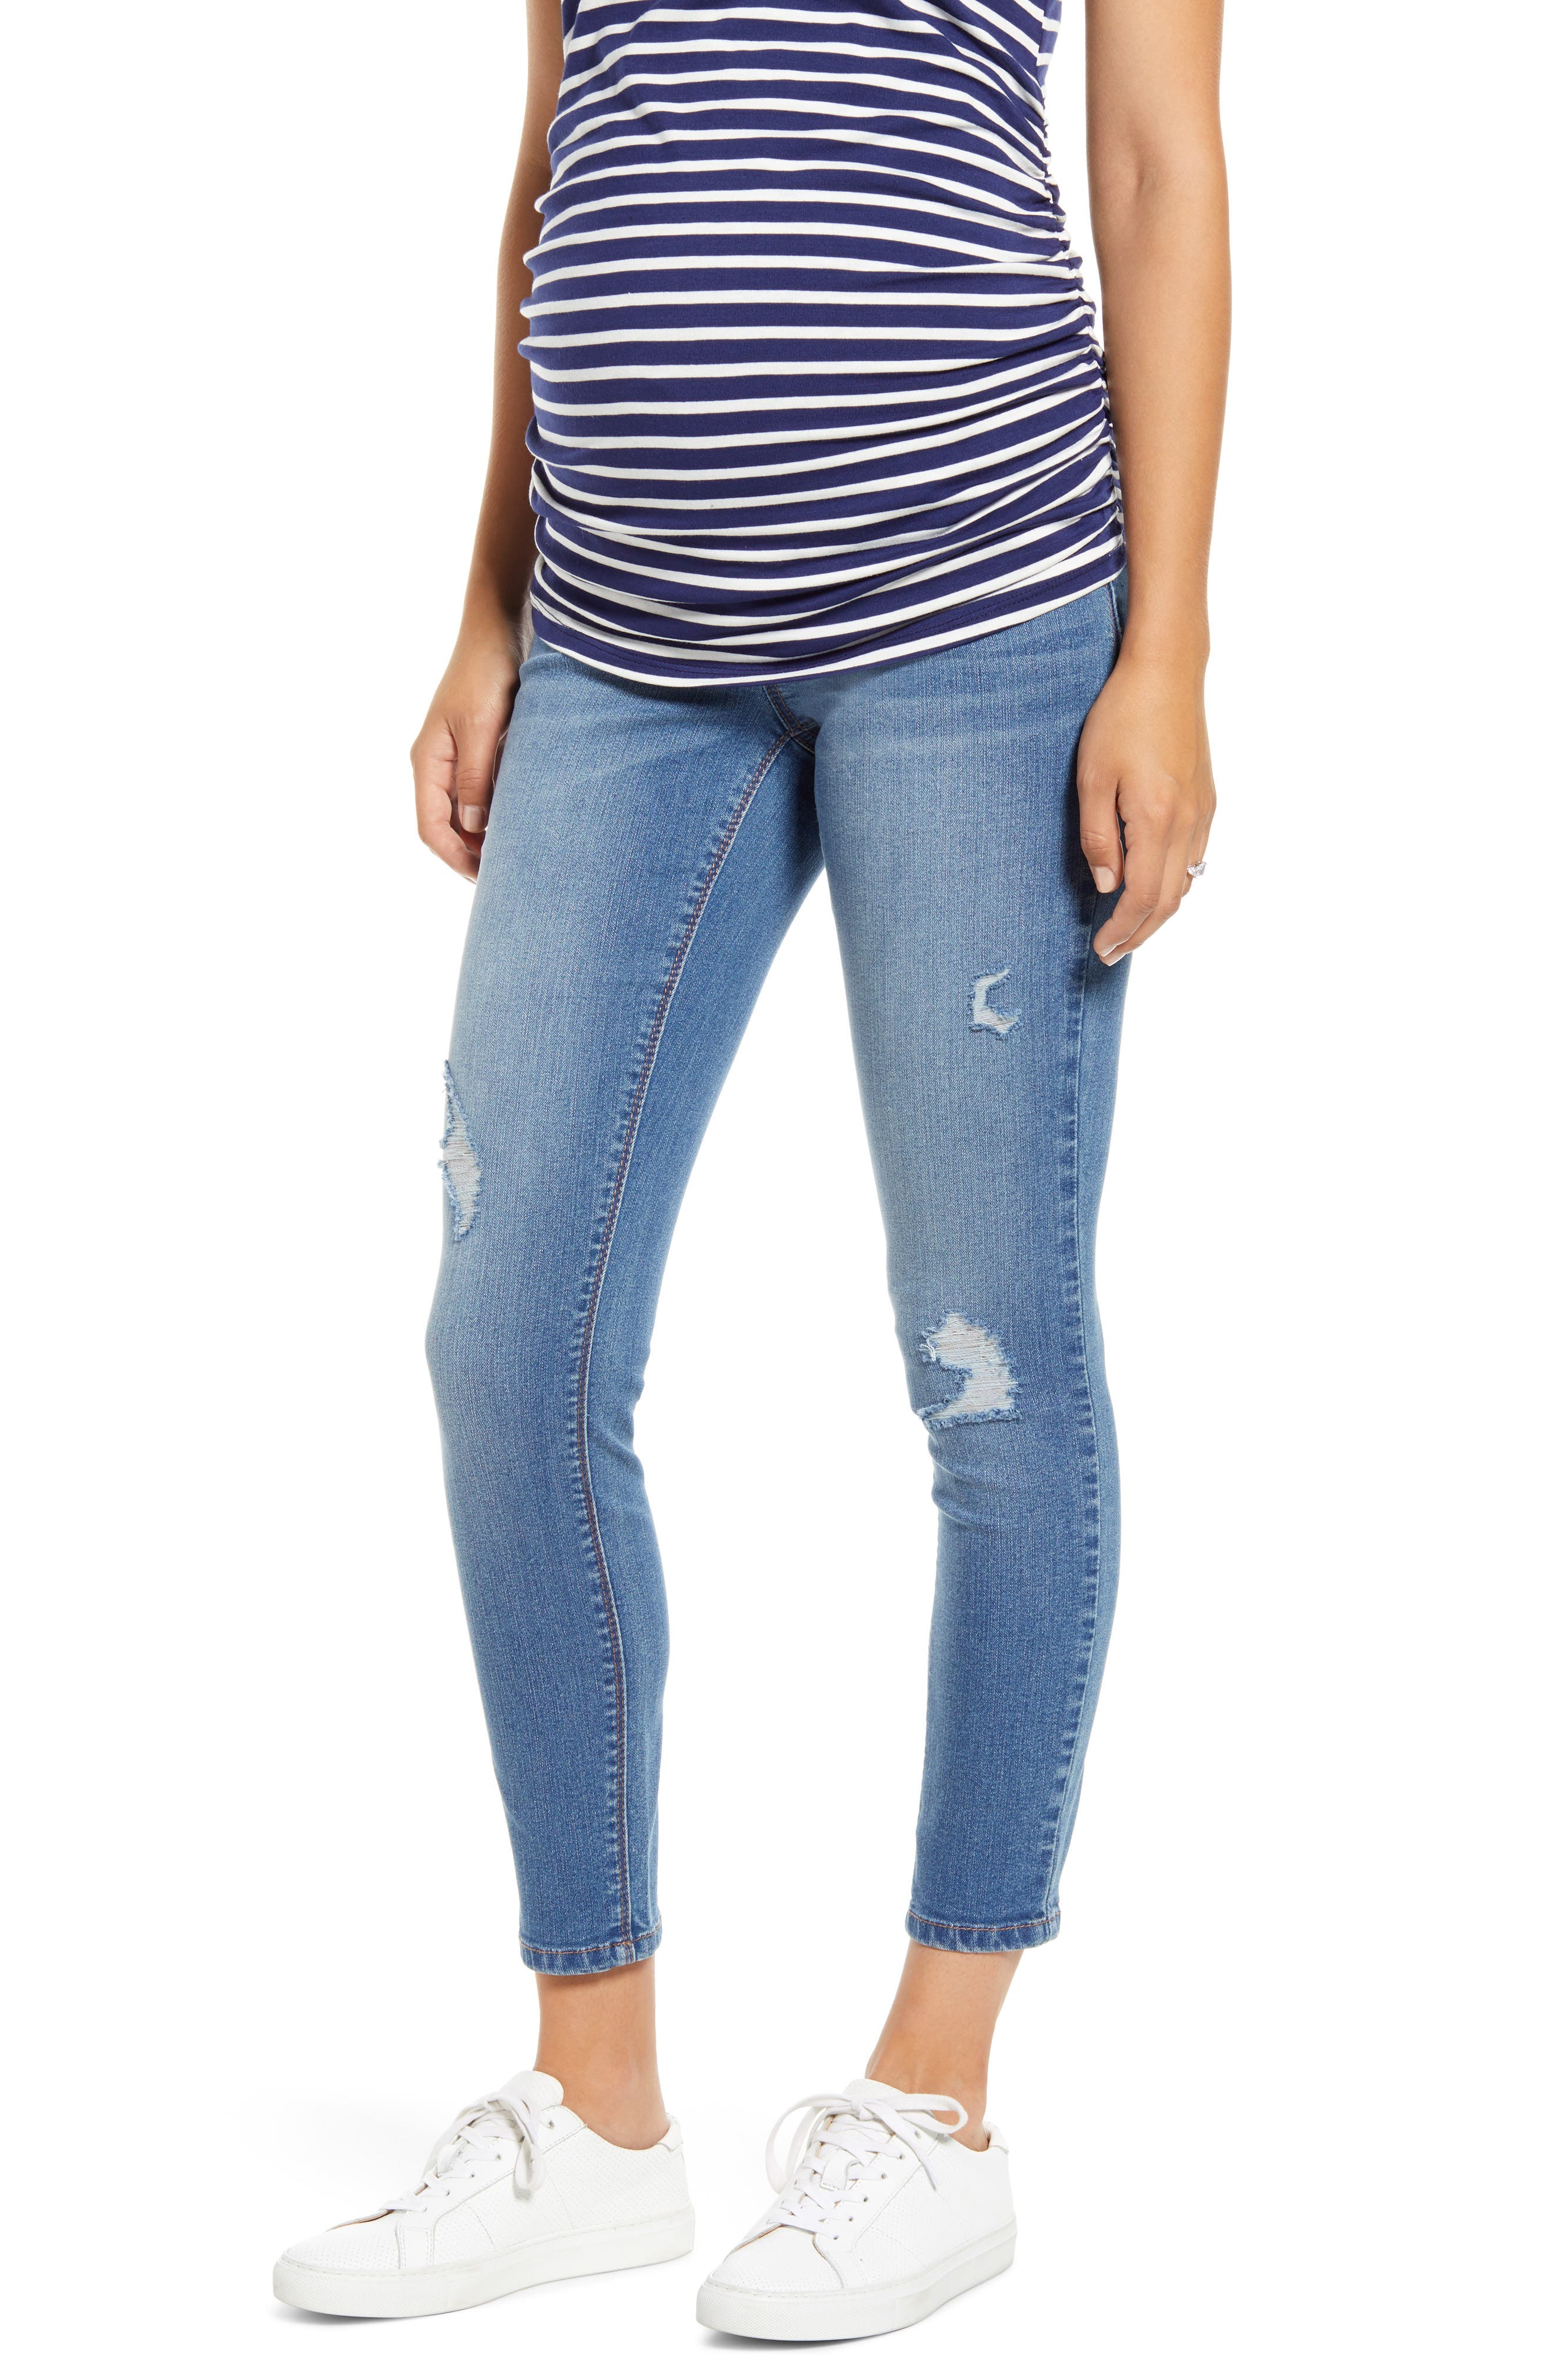 Women's 1822 Denim Re: denim Ankle Skinny Maternity Jeans